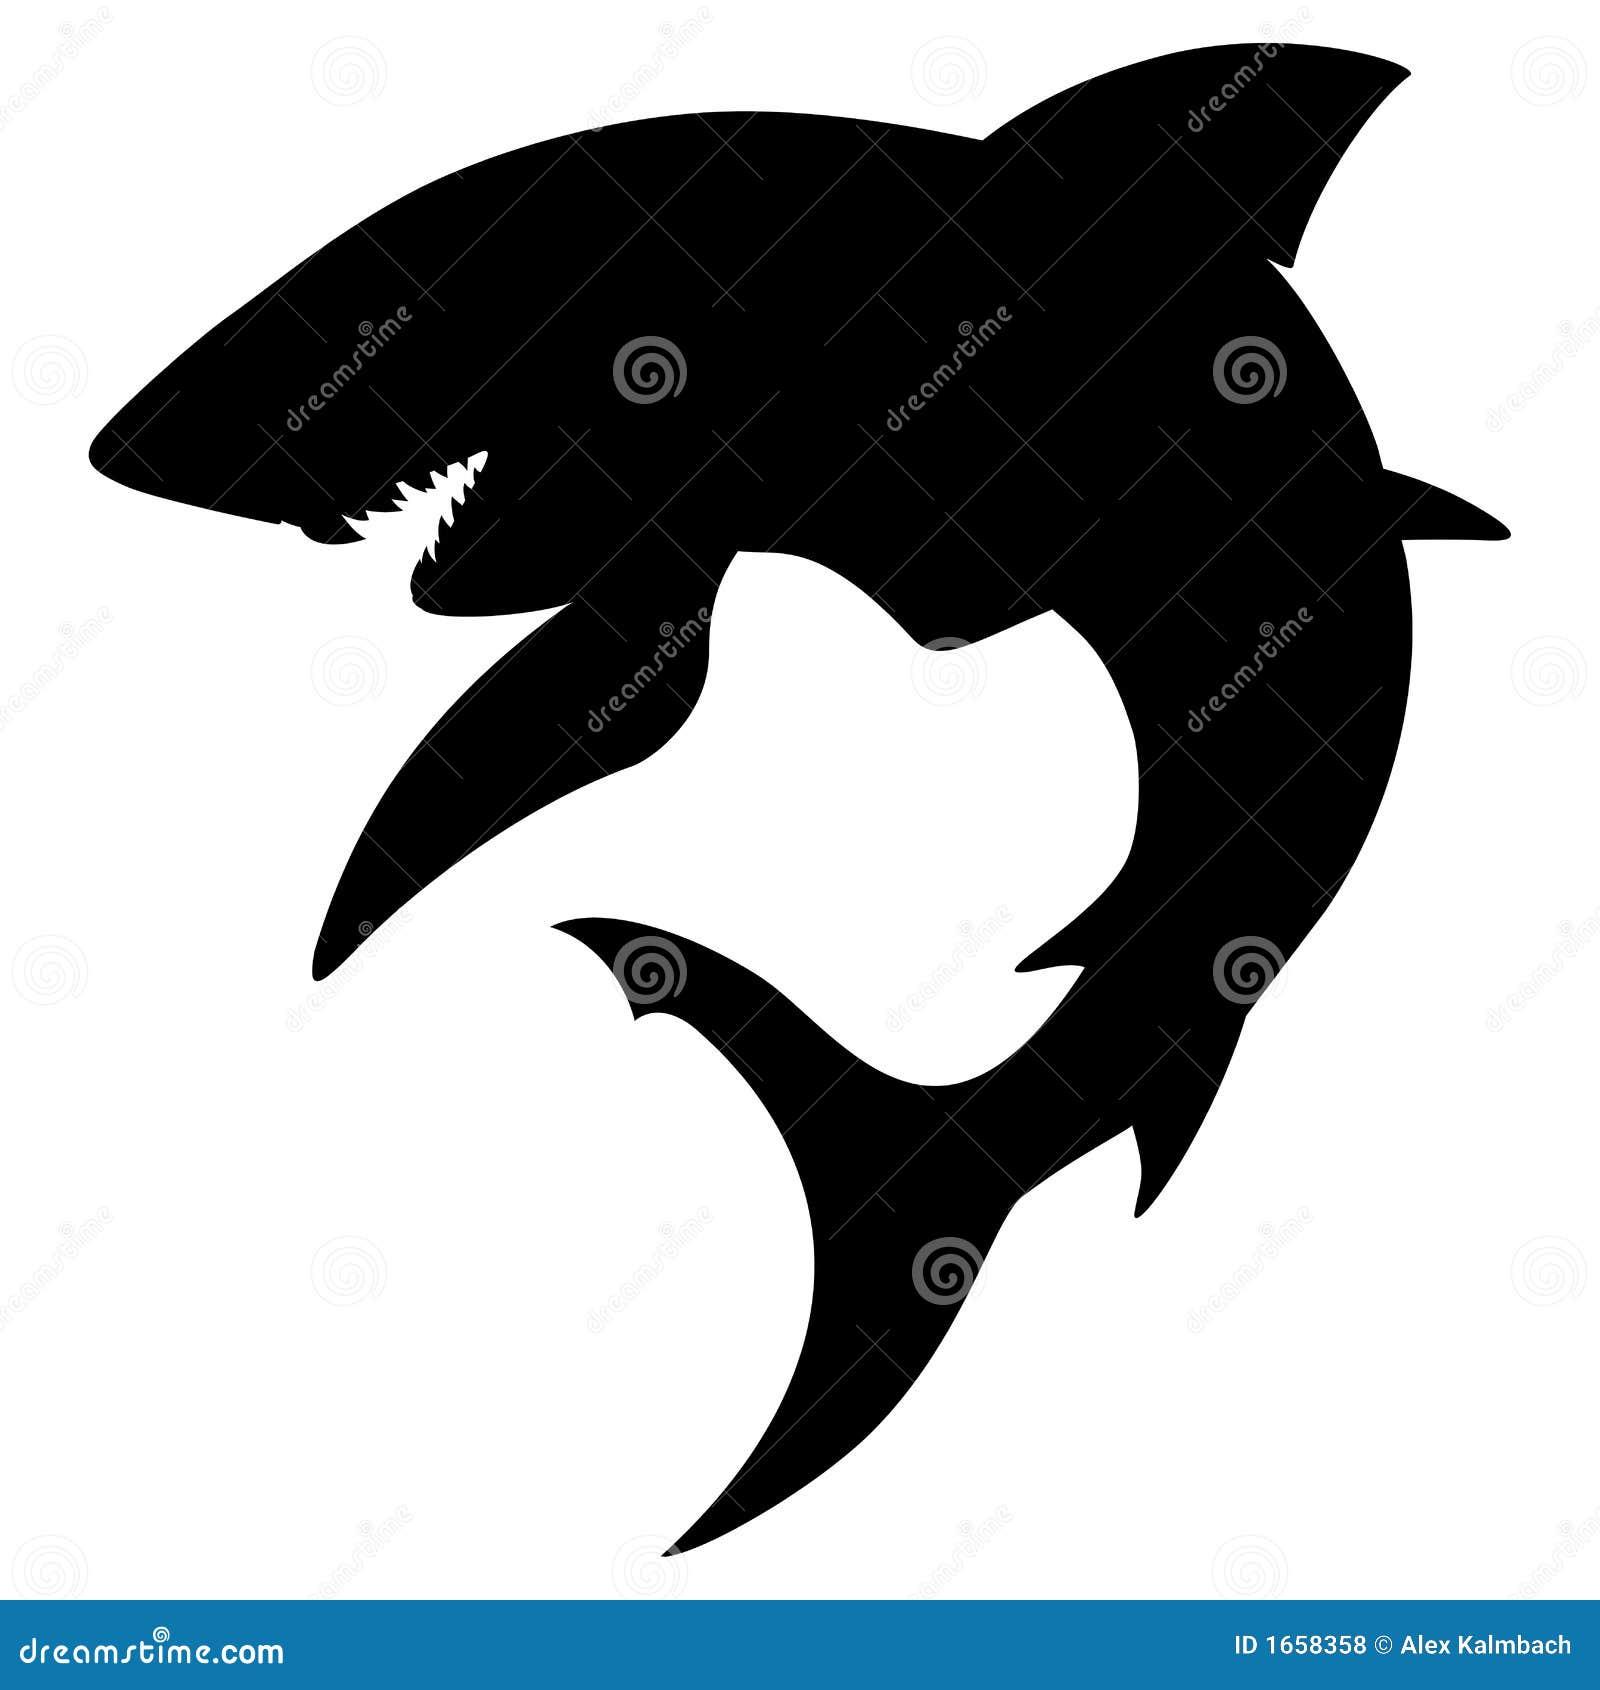 Shark Silhouette Royalty Free Stock Photos Image 1658358